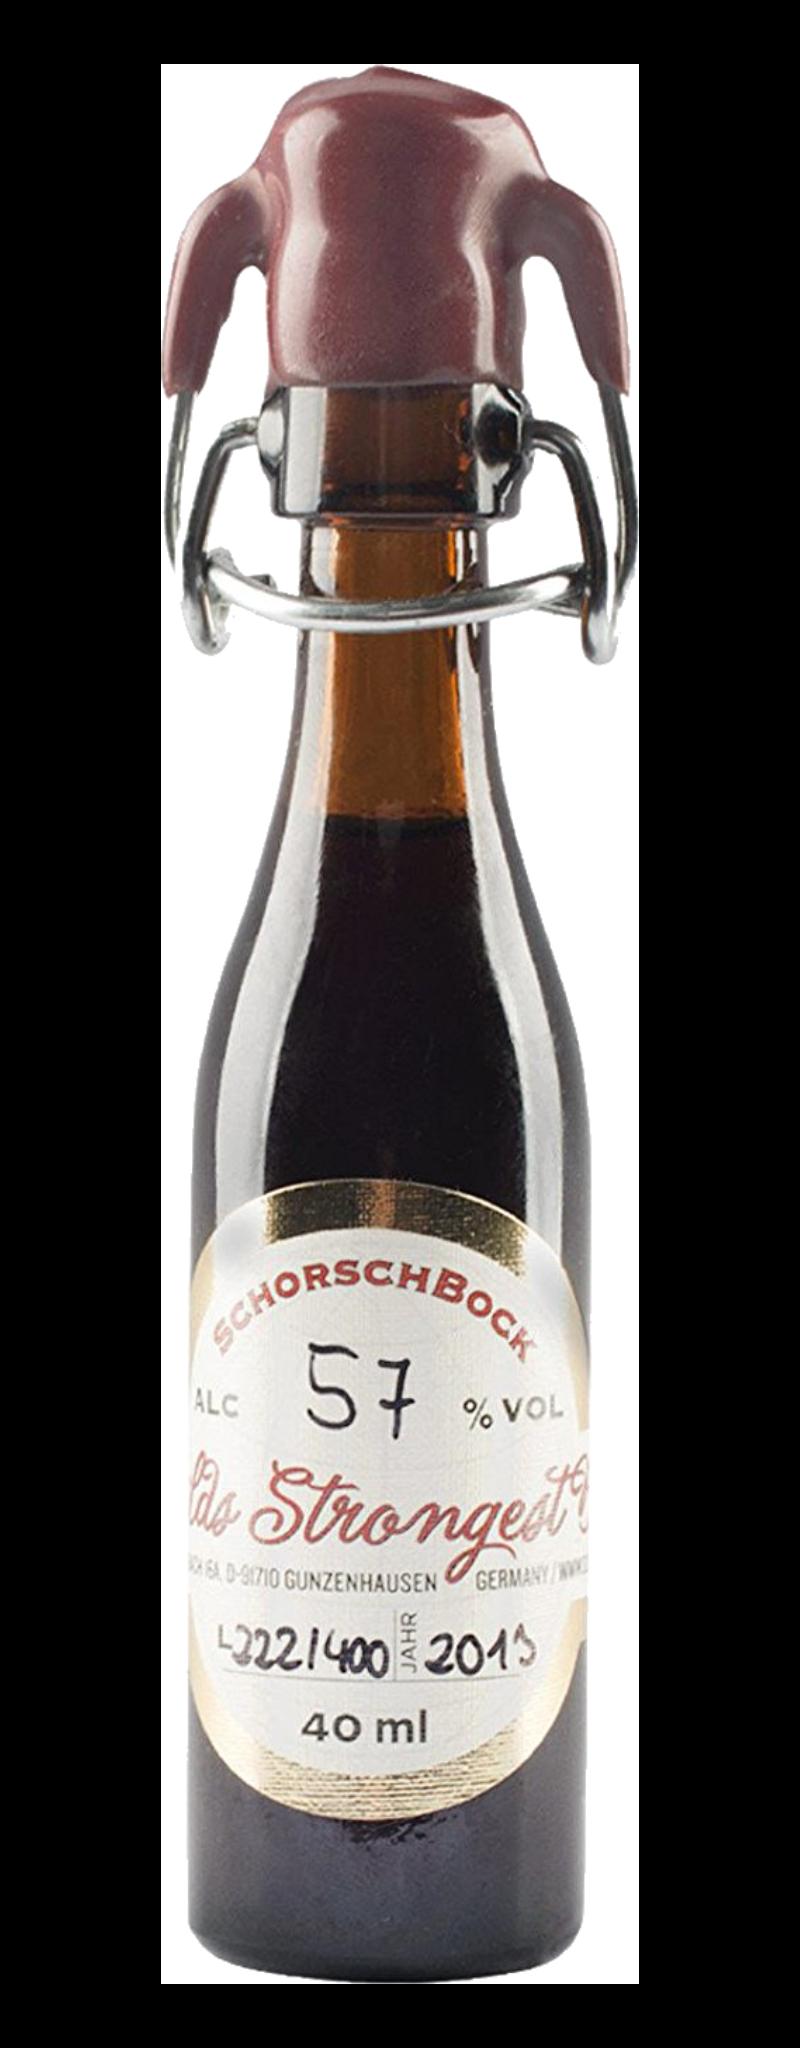 Schorsch Bock 57 (6 chai/thùng)  - 330ml